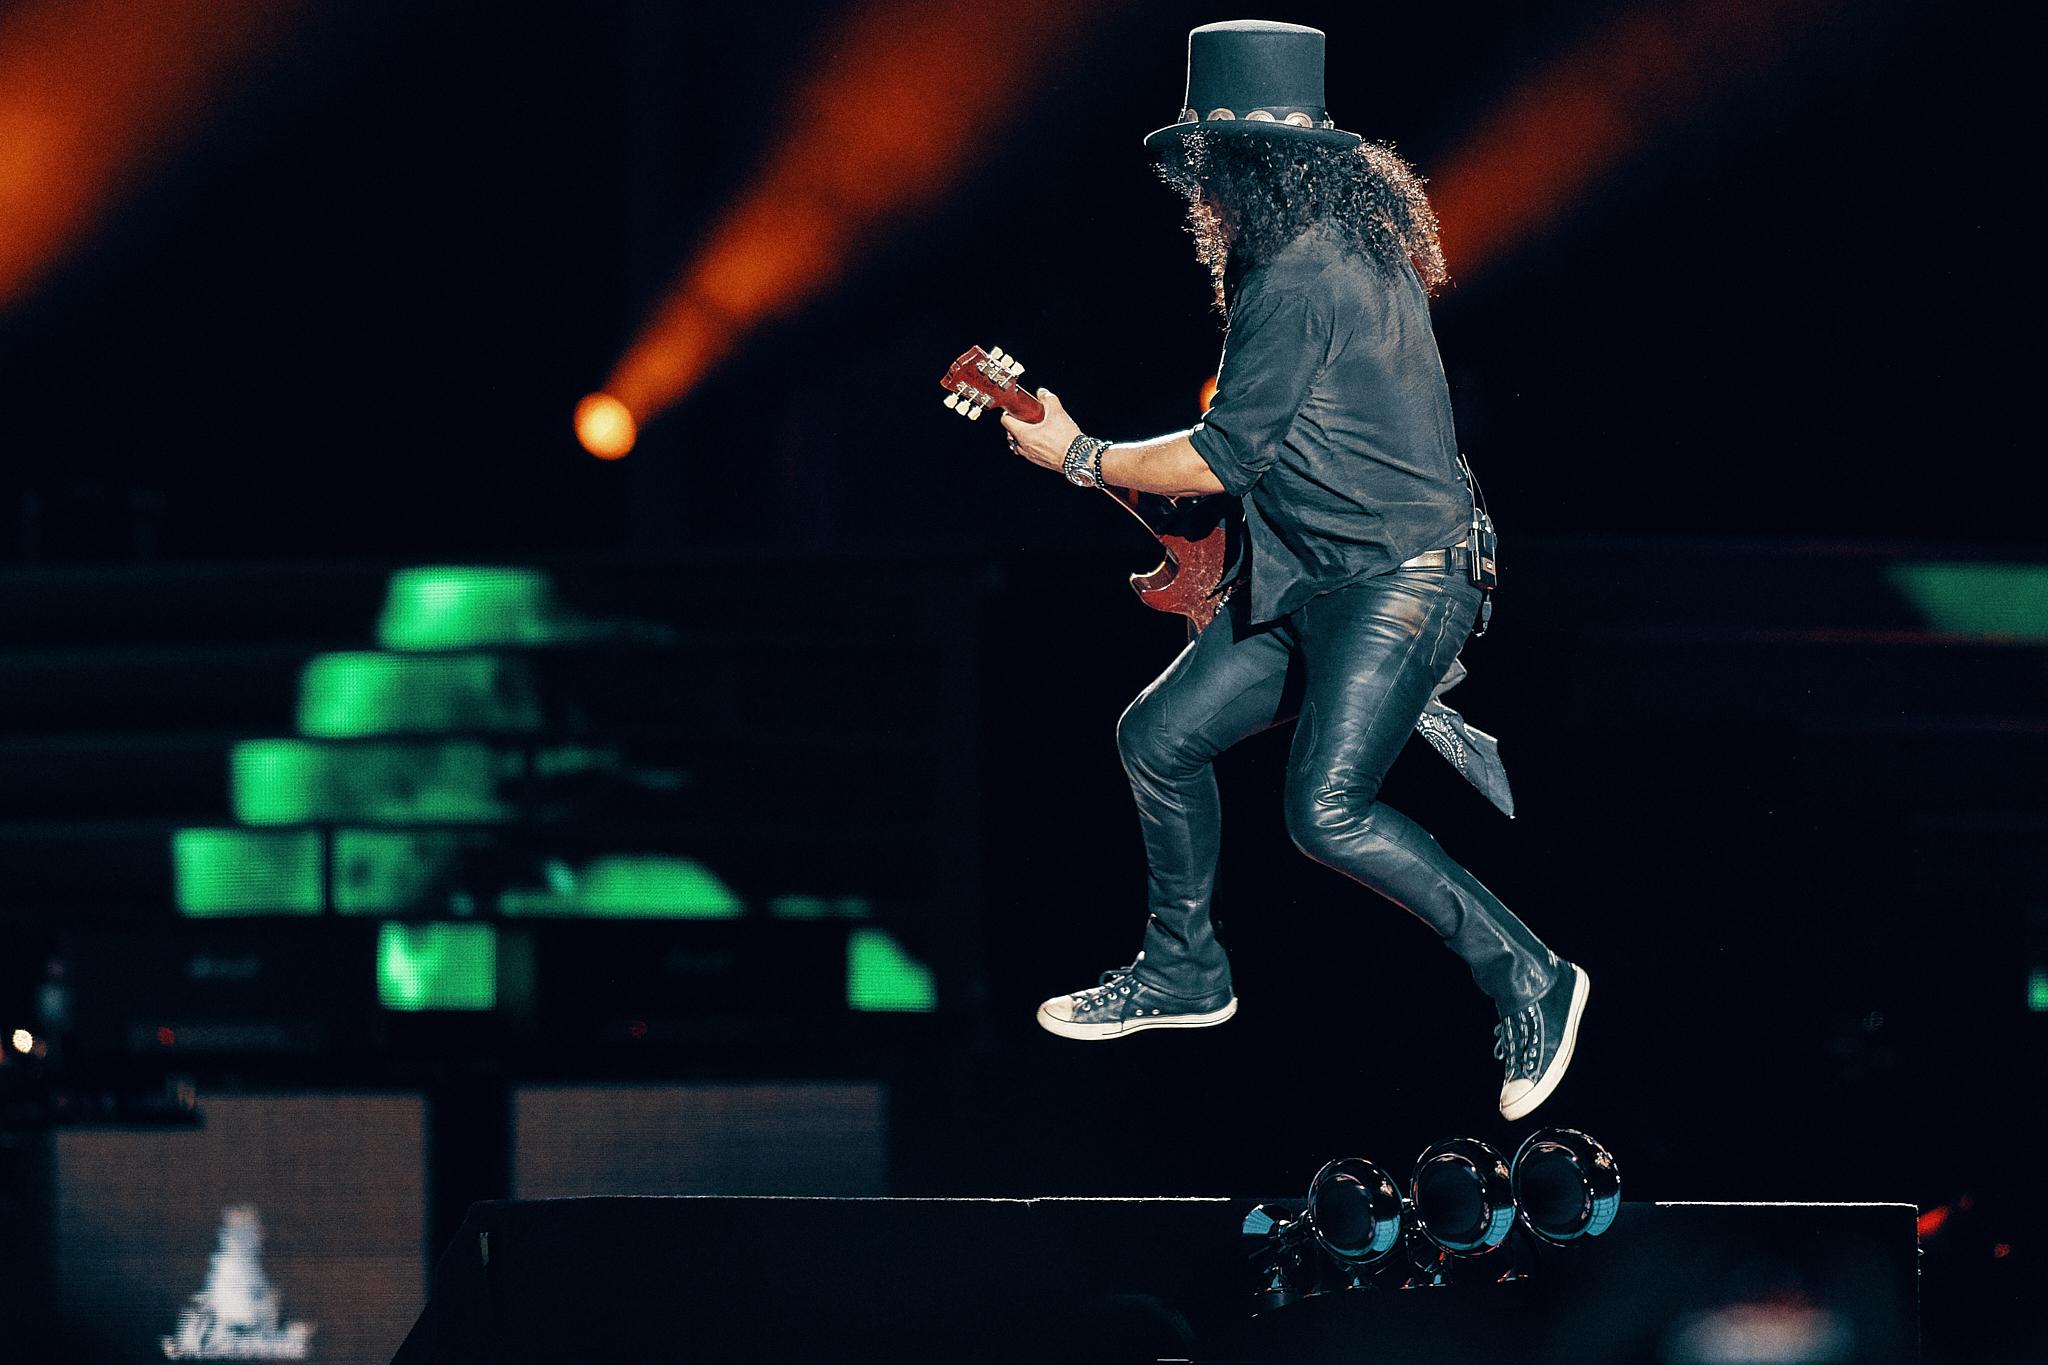 Guns_N_Roses_US_Bank_Stadium_Minneapolis_Minnesota_Photography_By_Joe_Lemke_028.JPG